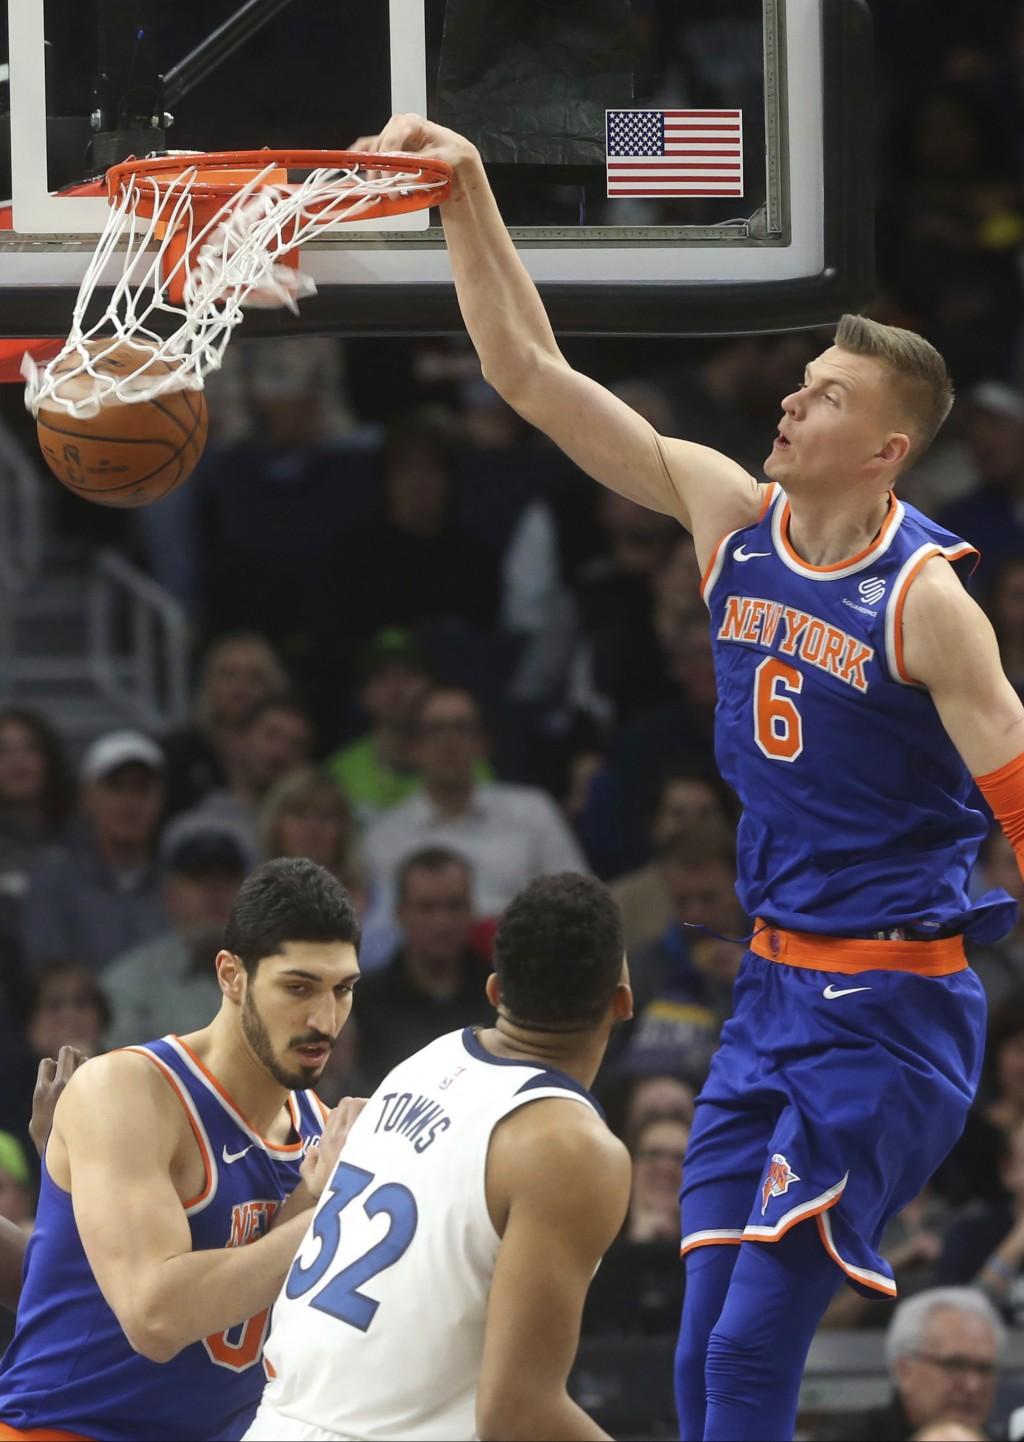 New York Knicks' Kristaps Porzingis (6), of Latvia, dunks as Minnesota Timberwolves' Karl-Anthony Towns, bottom, looks on in the first half of an NBA